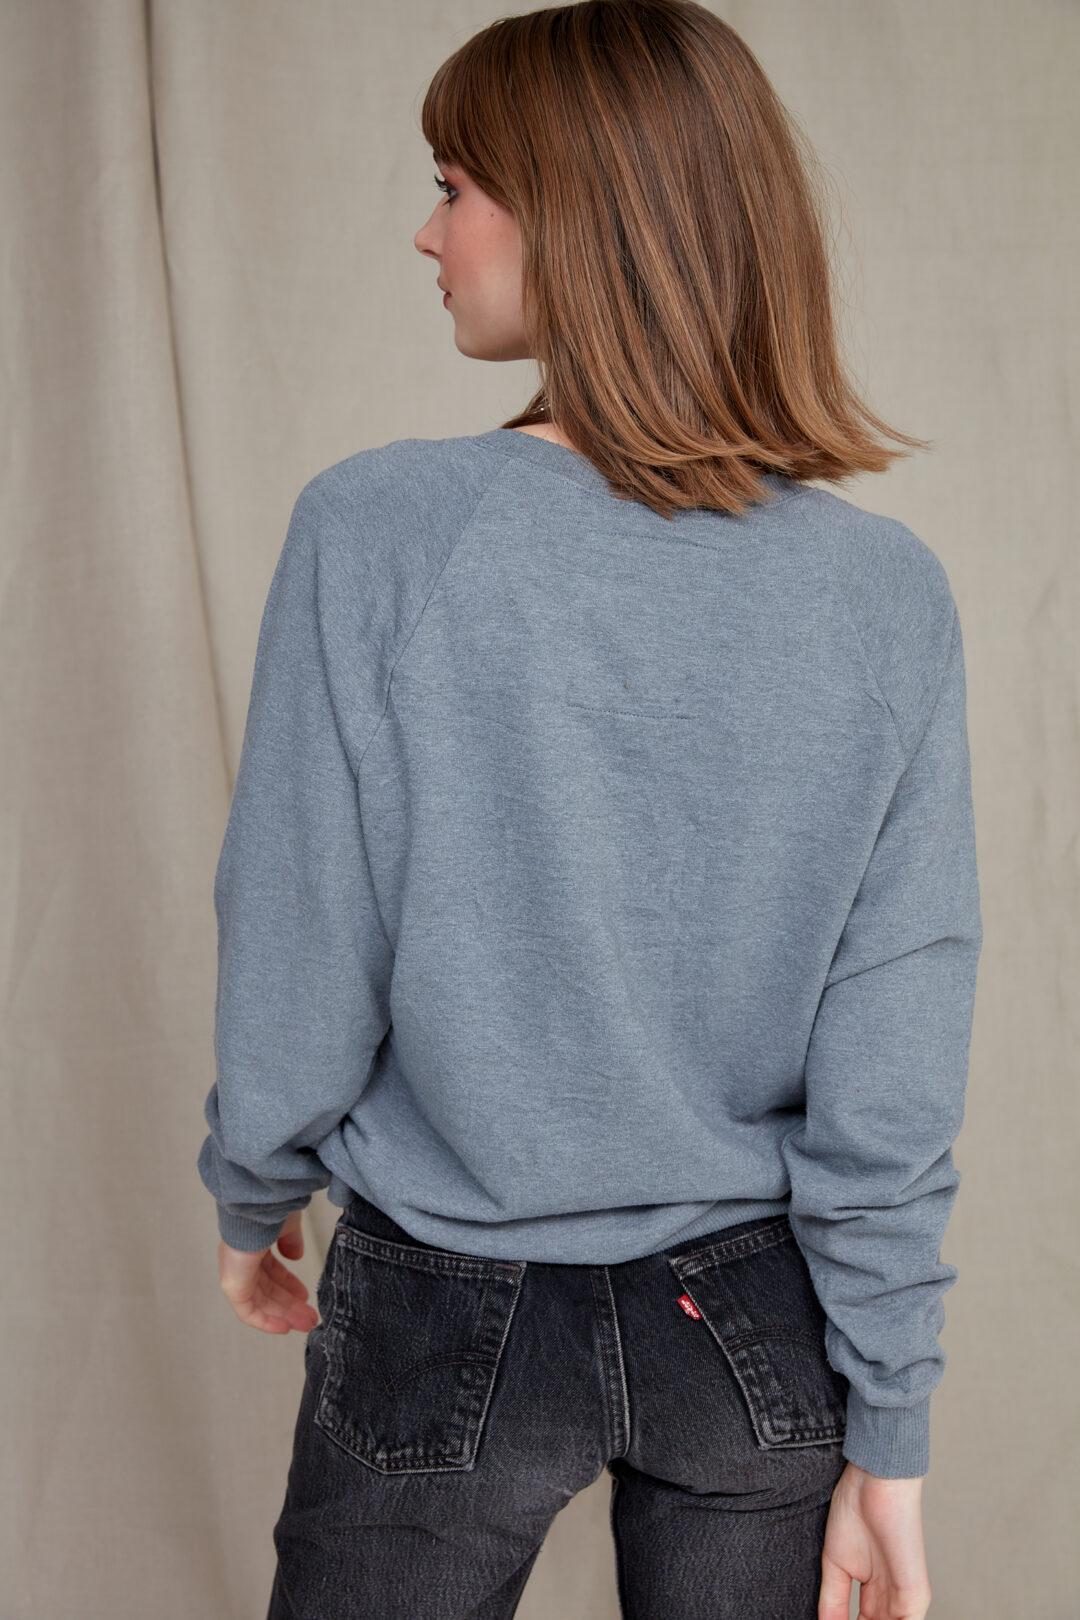 collect23 disney sweatshirt